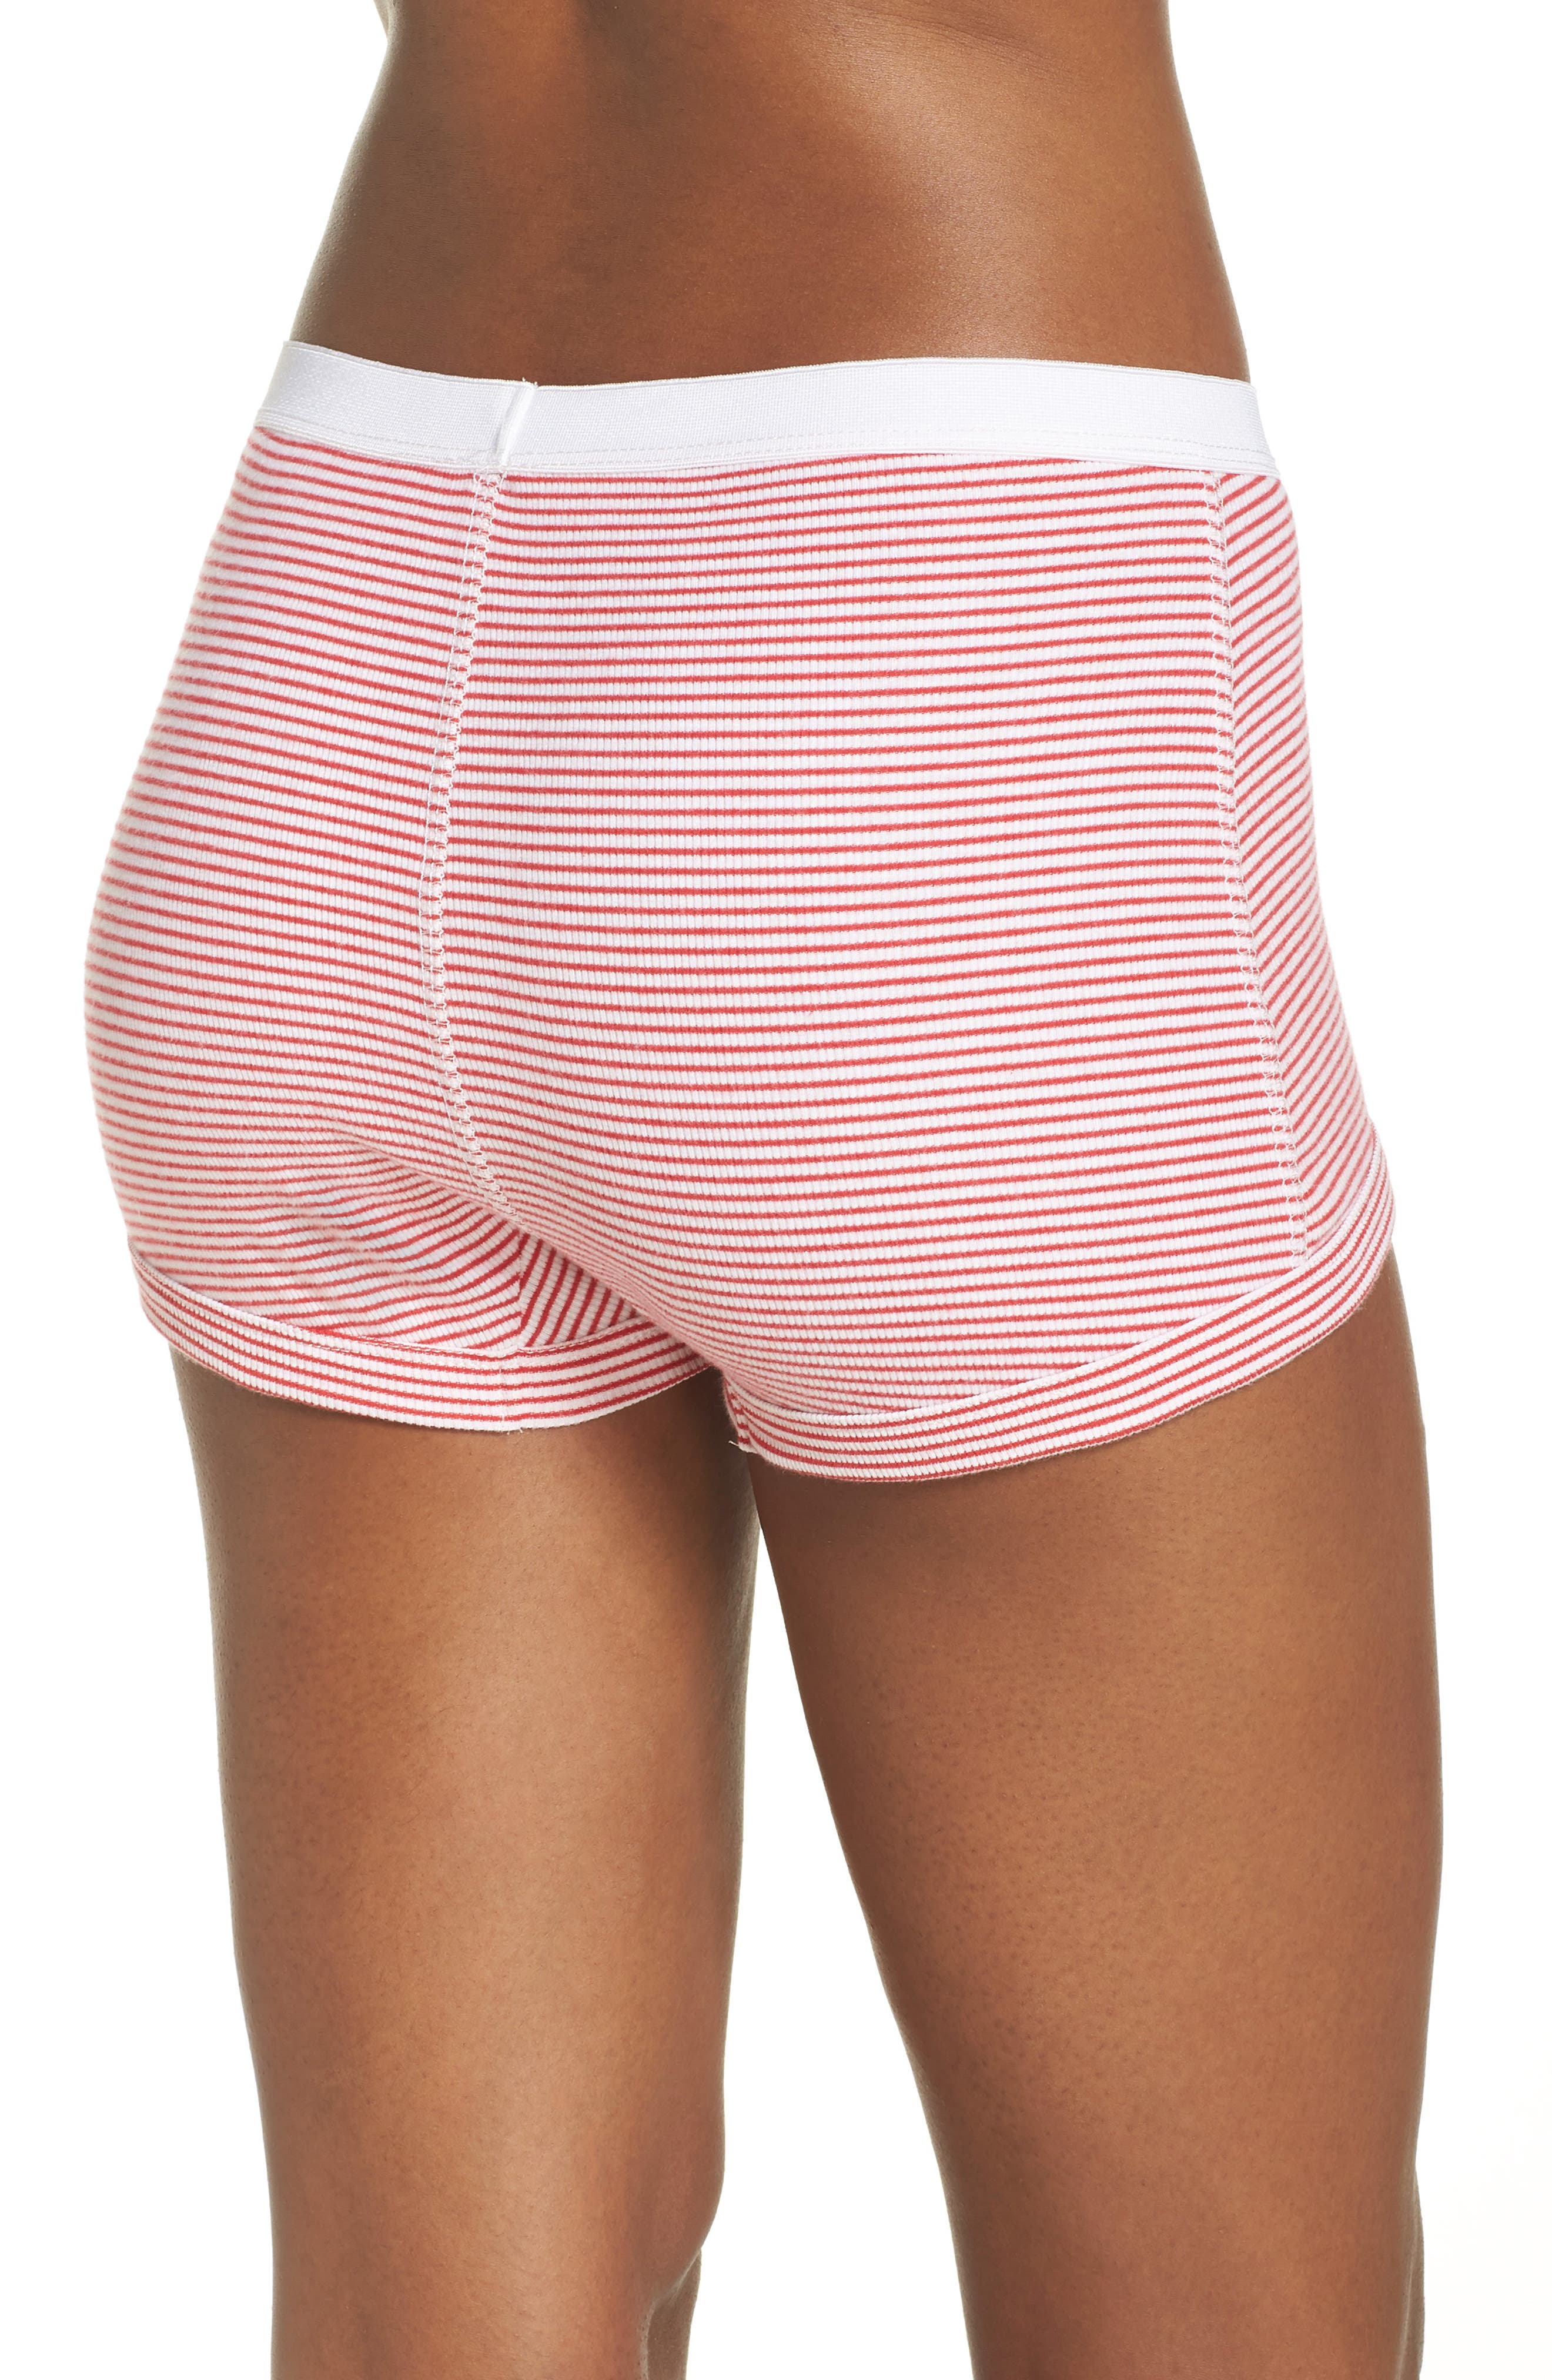 Peony Shorts,                             Alternate thumbnail 2, color,                             Red Stripe